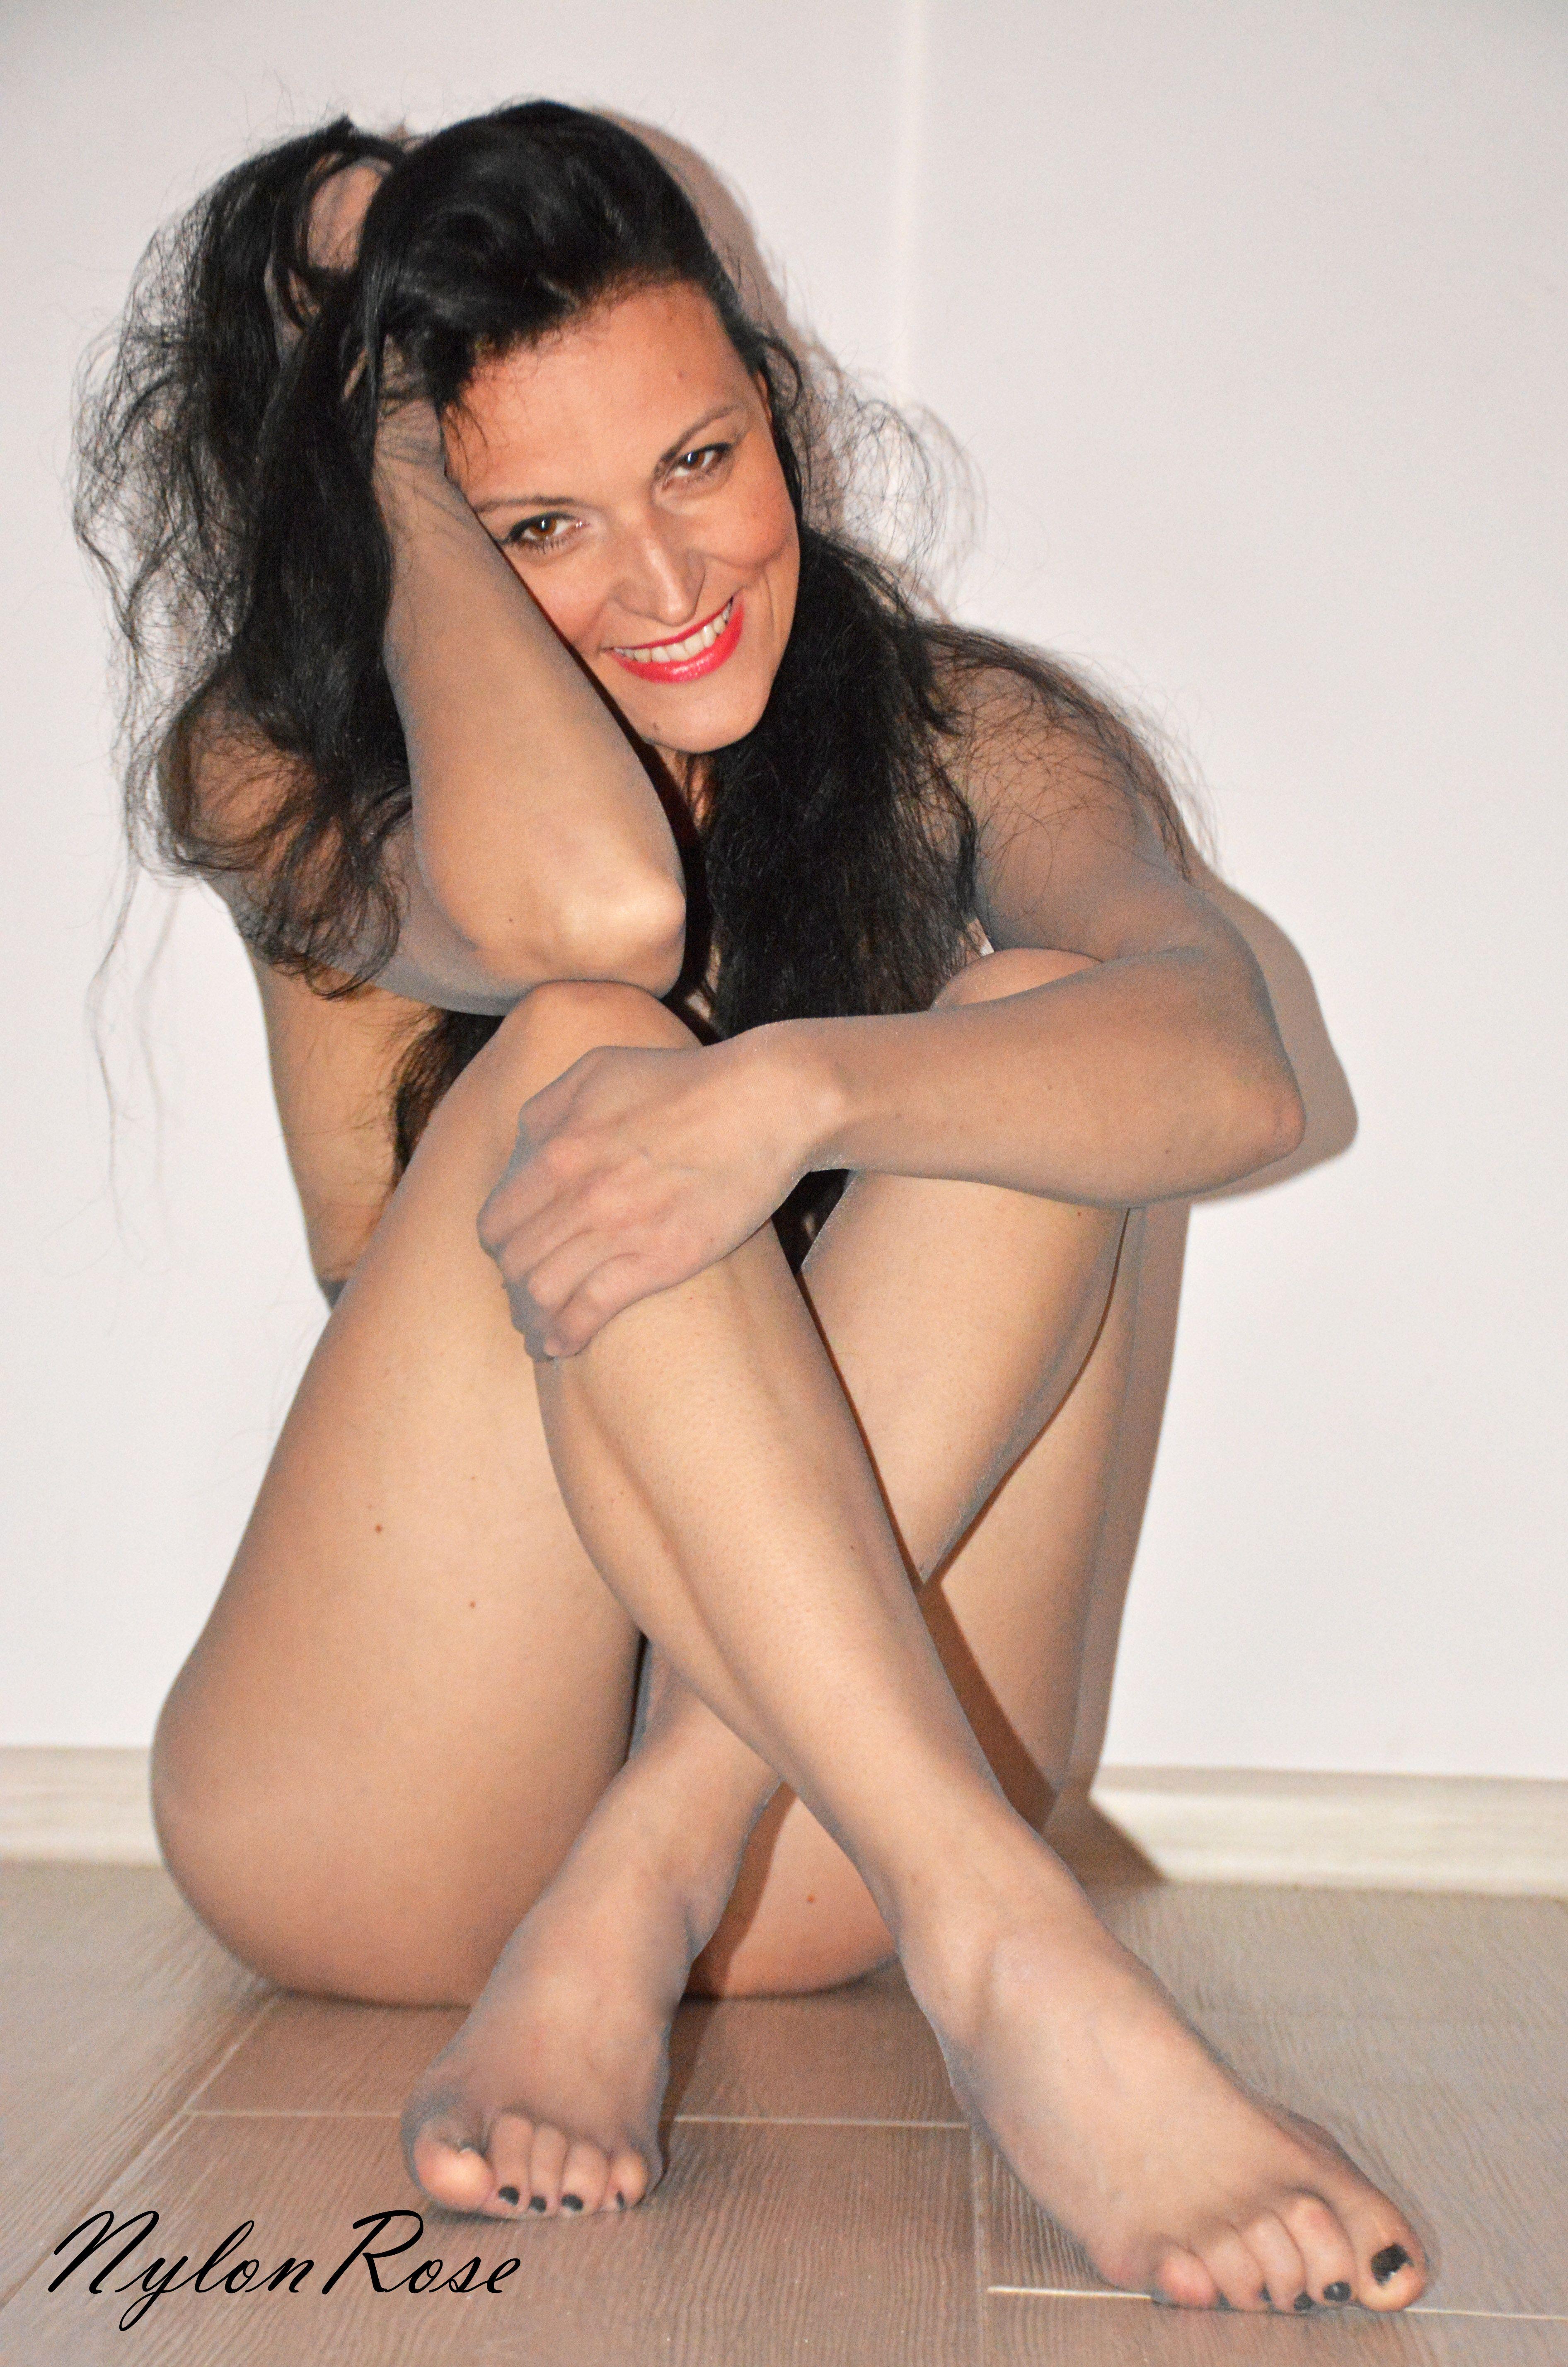 encasement pantyhose